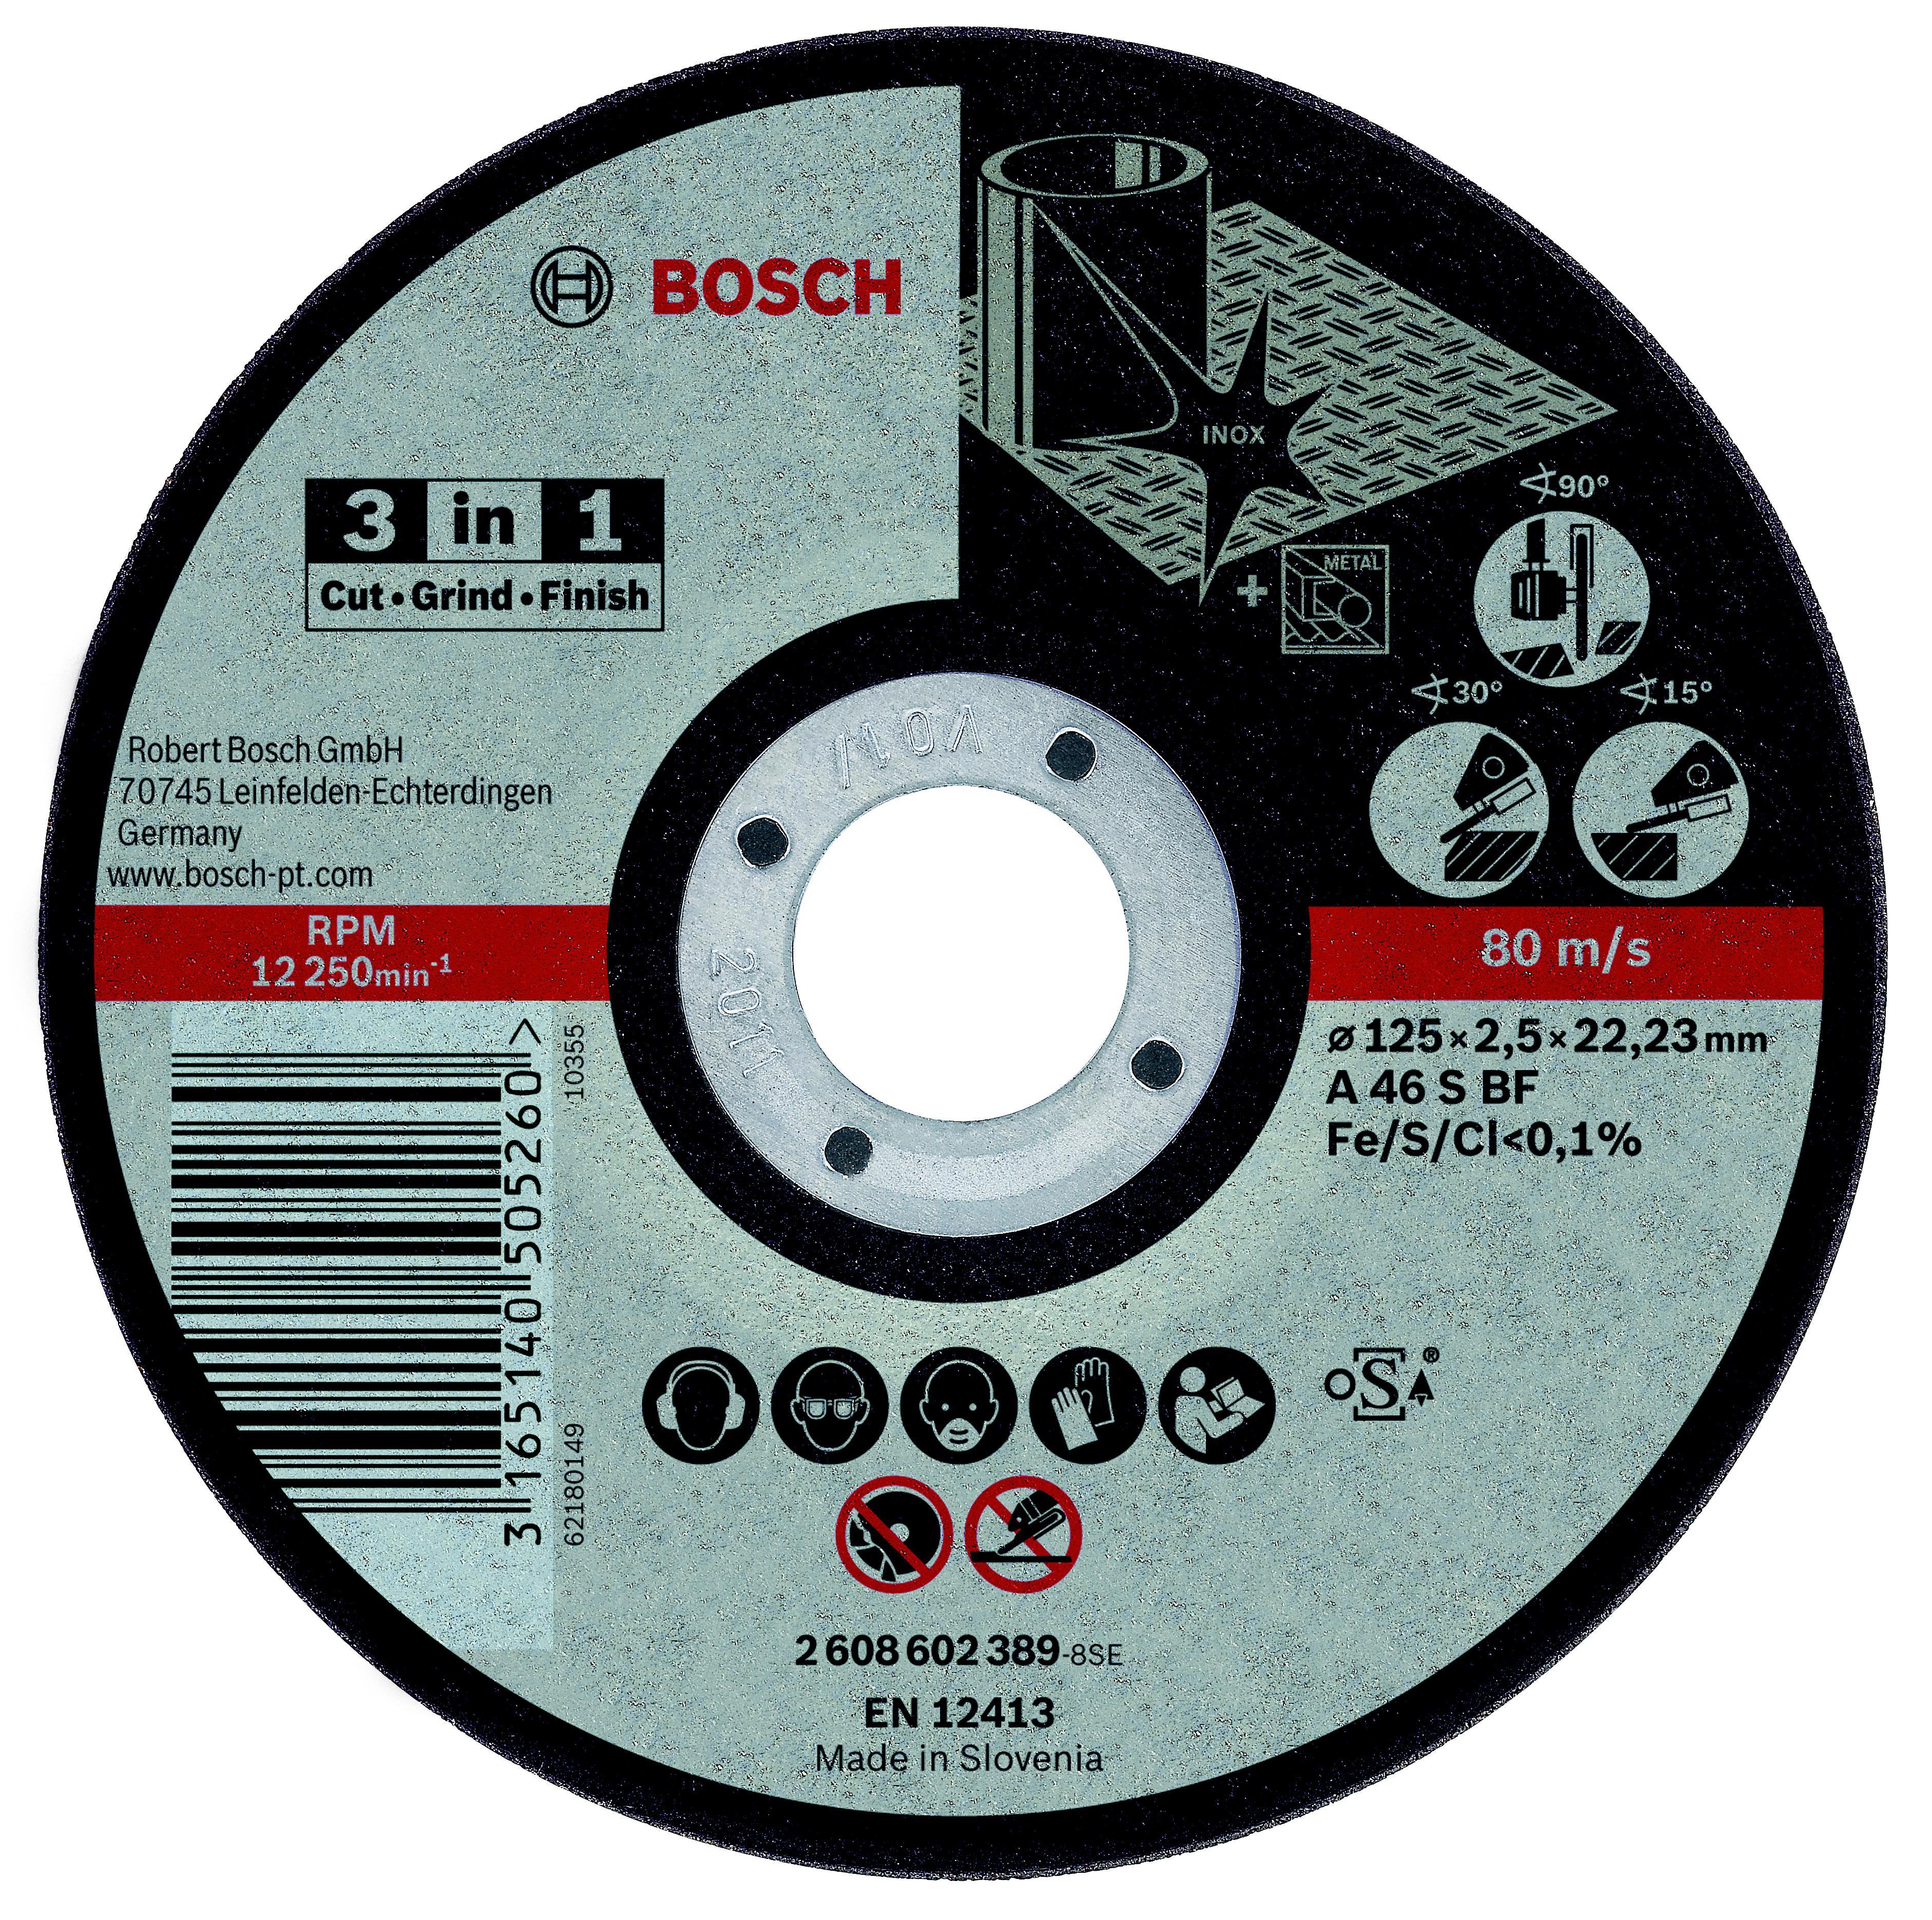 Фото 2/2 Bosch 3 in 1, 125 Х 2,5 Х 22, по нержавеющей стали, Круг отрезной